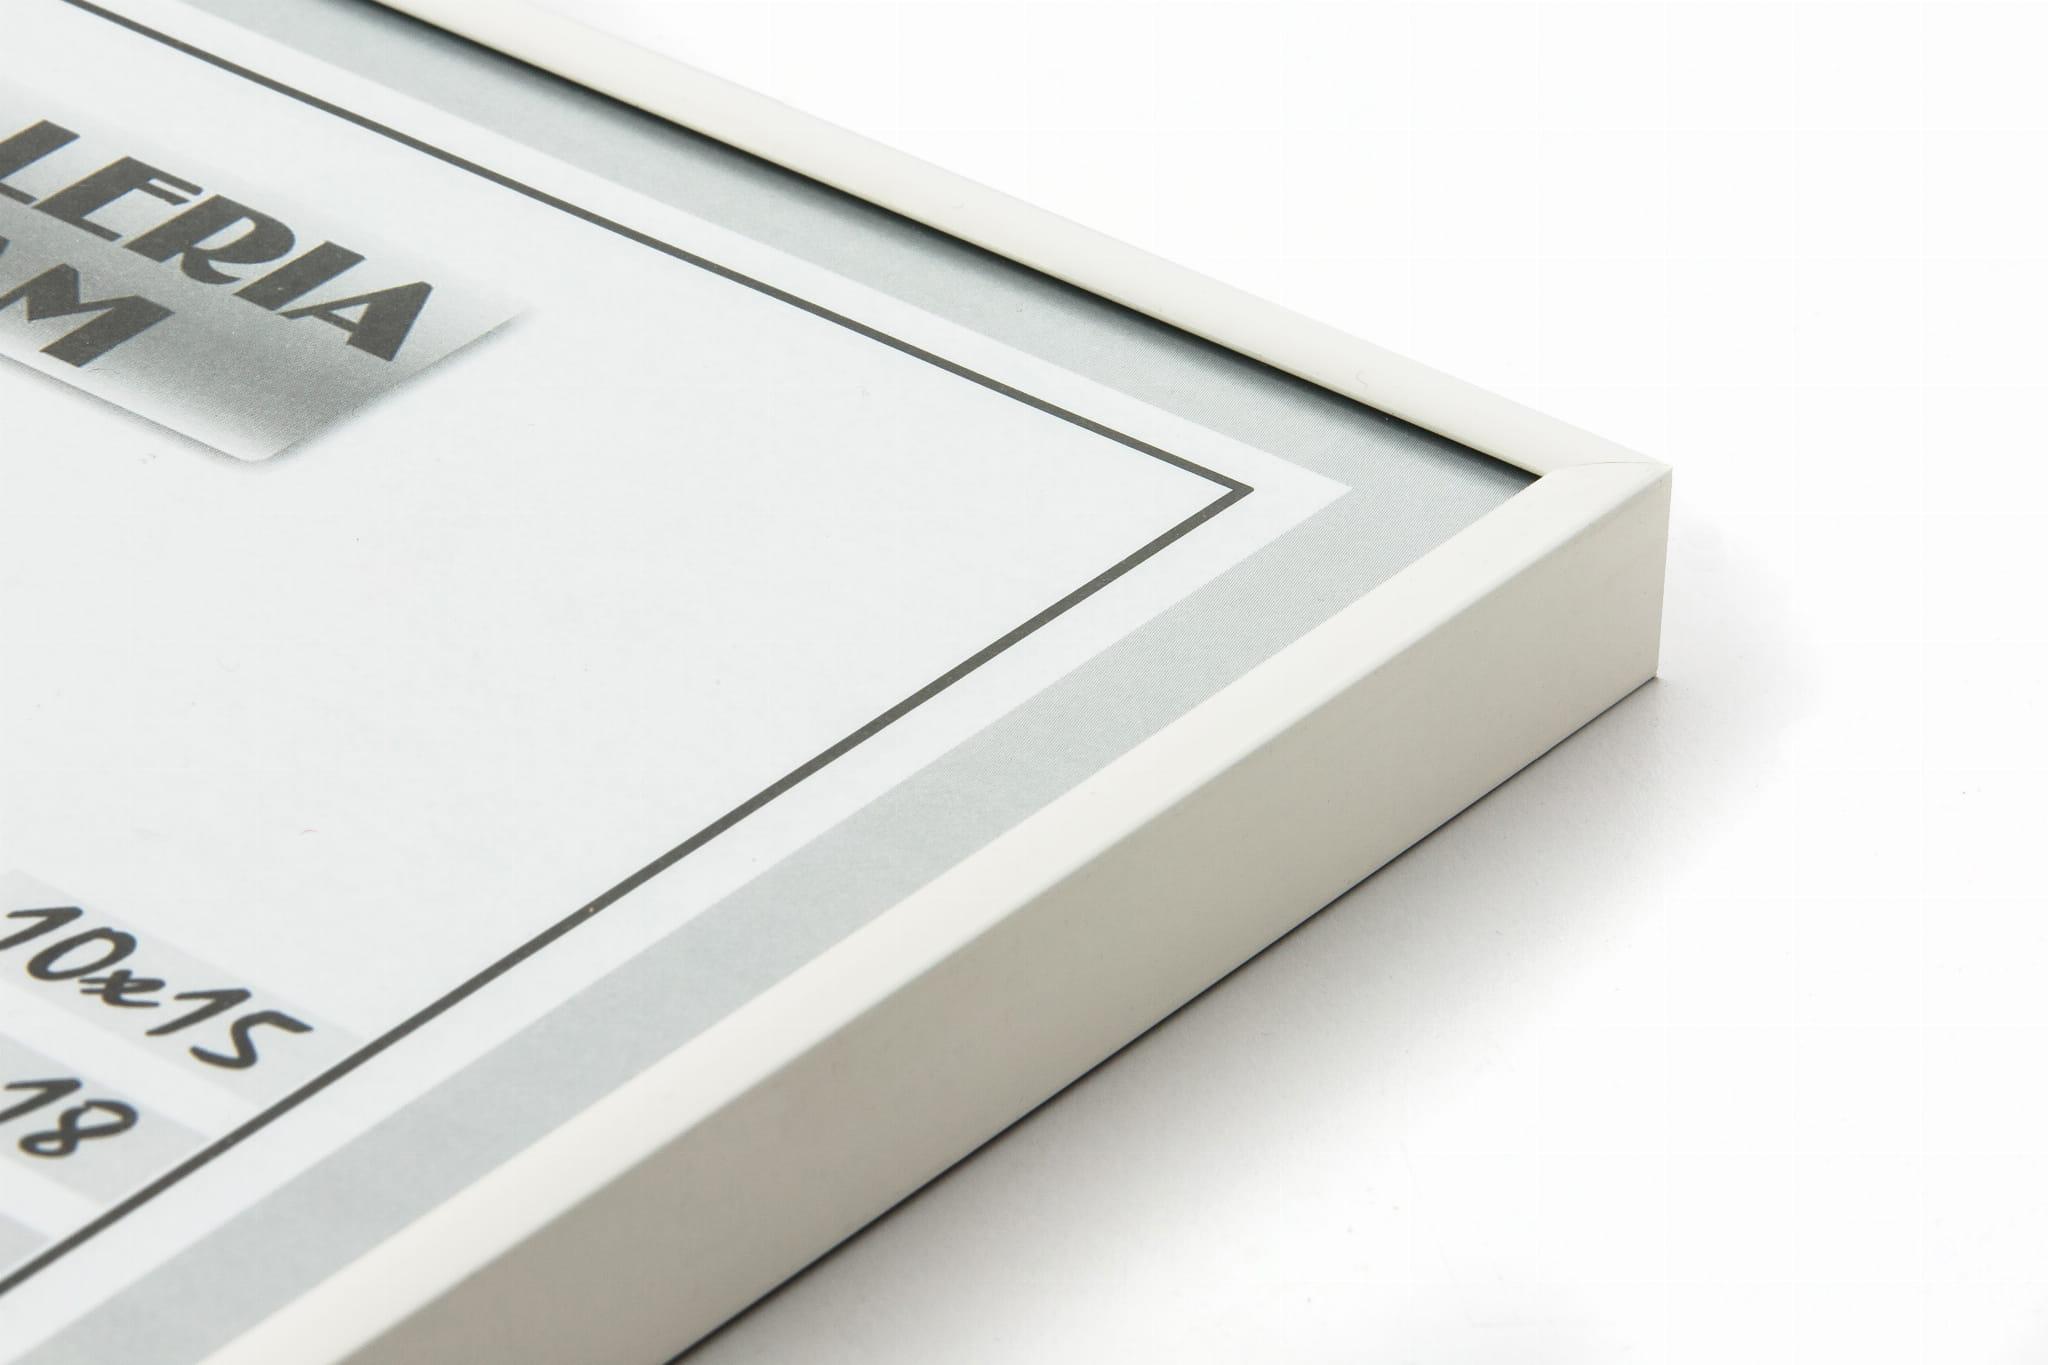 rama aluminiowa alu g 70x100. Black Bedroom Furniture Sets. Home Design Ideas